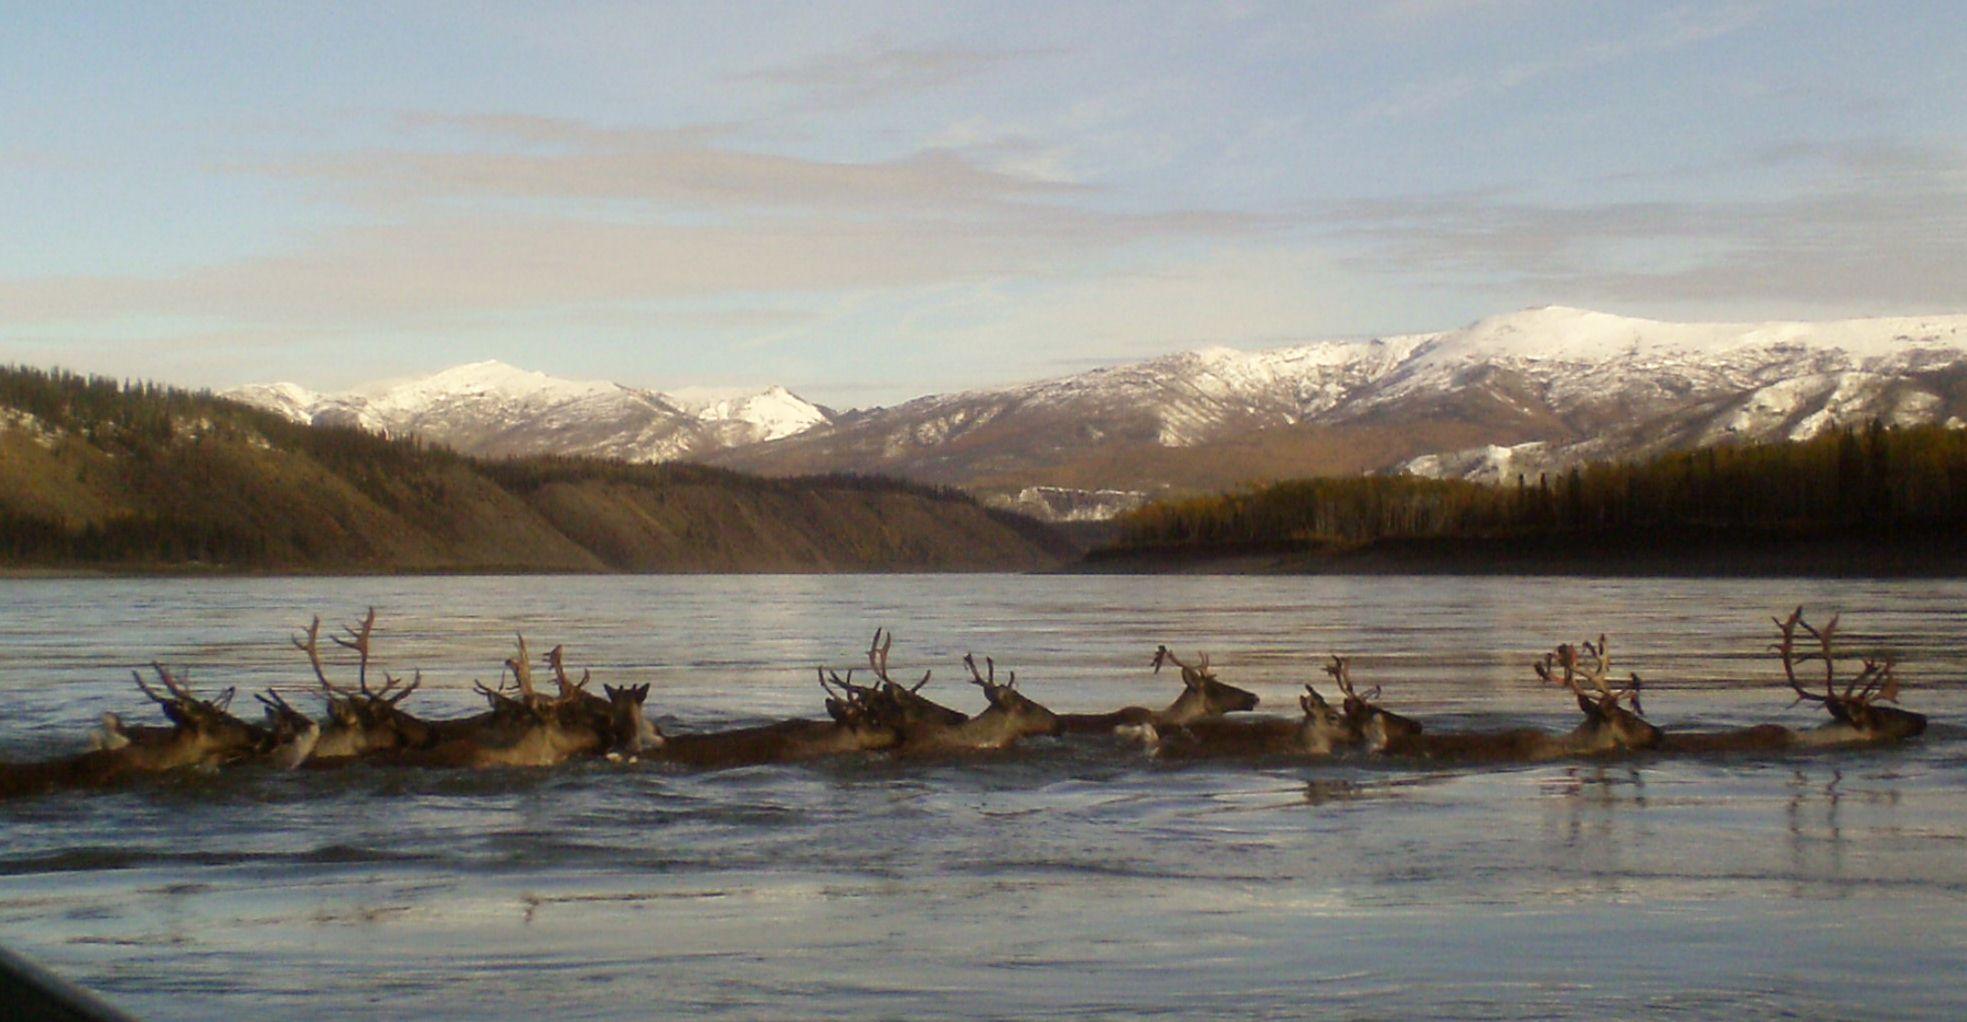 caribou Yukon River, Alaska, National Park Service Yukon Charley Rivers Preserve